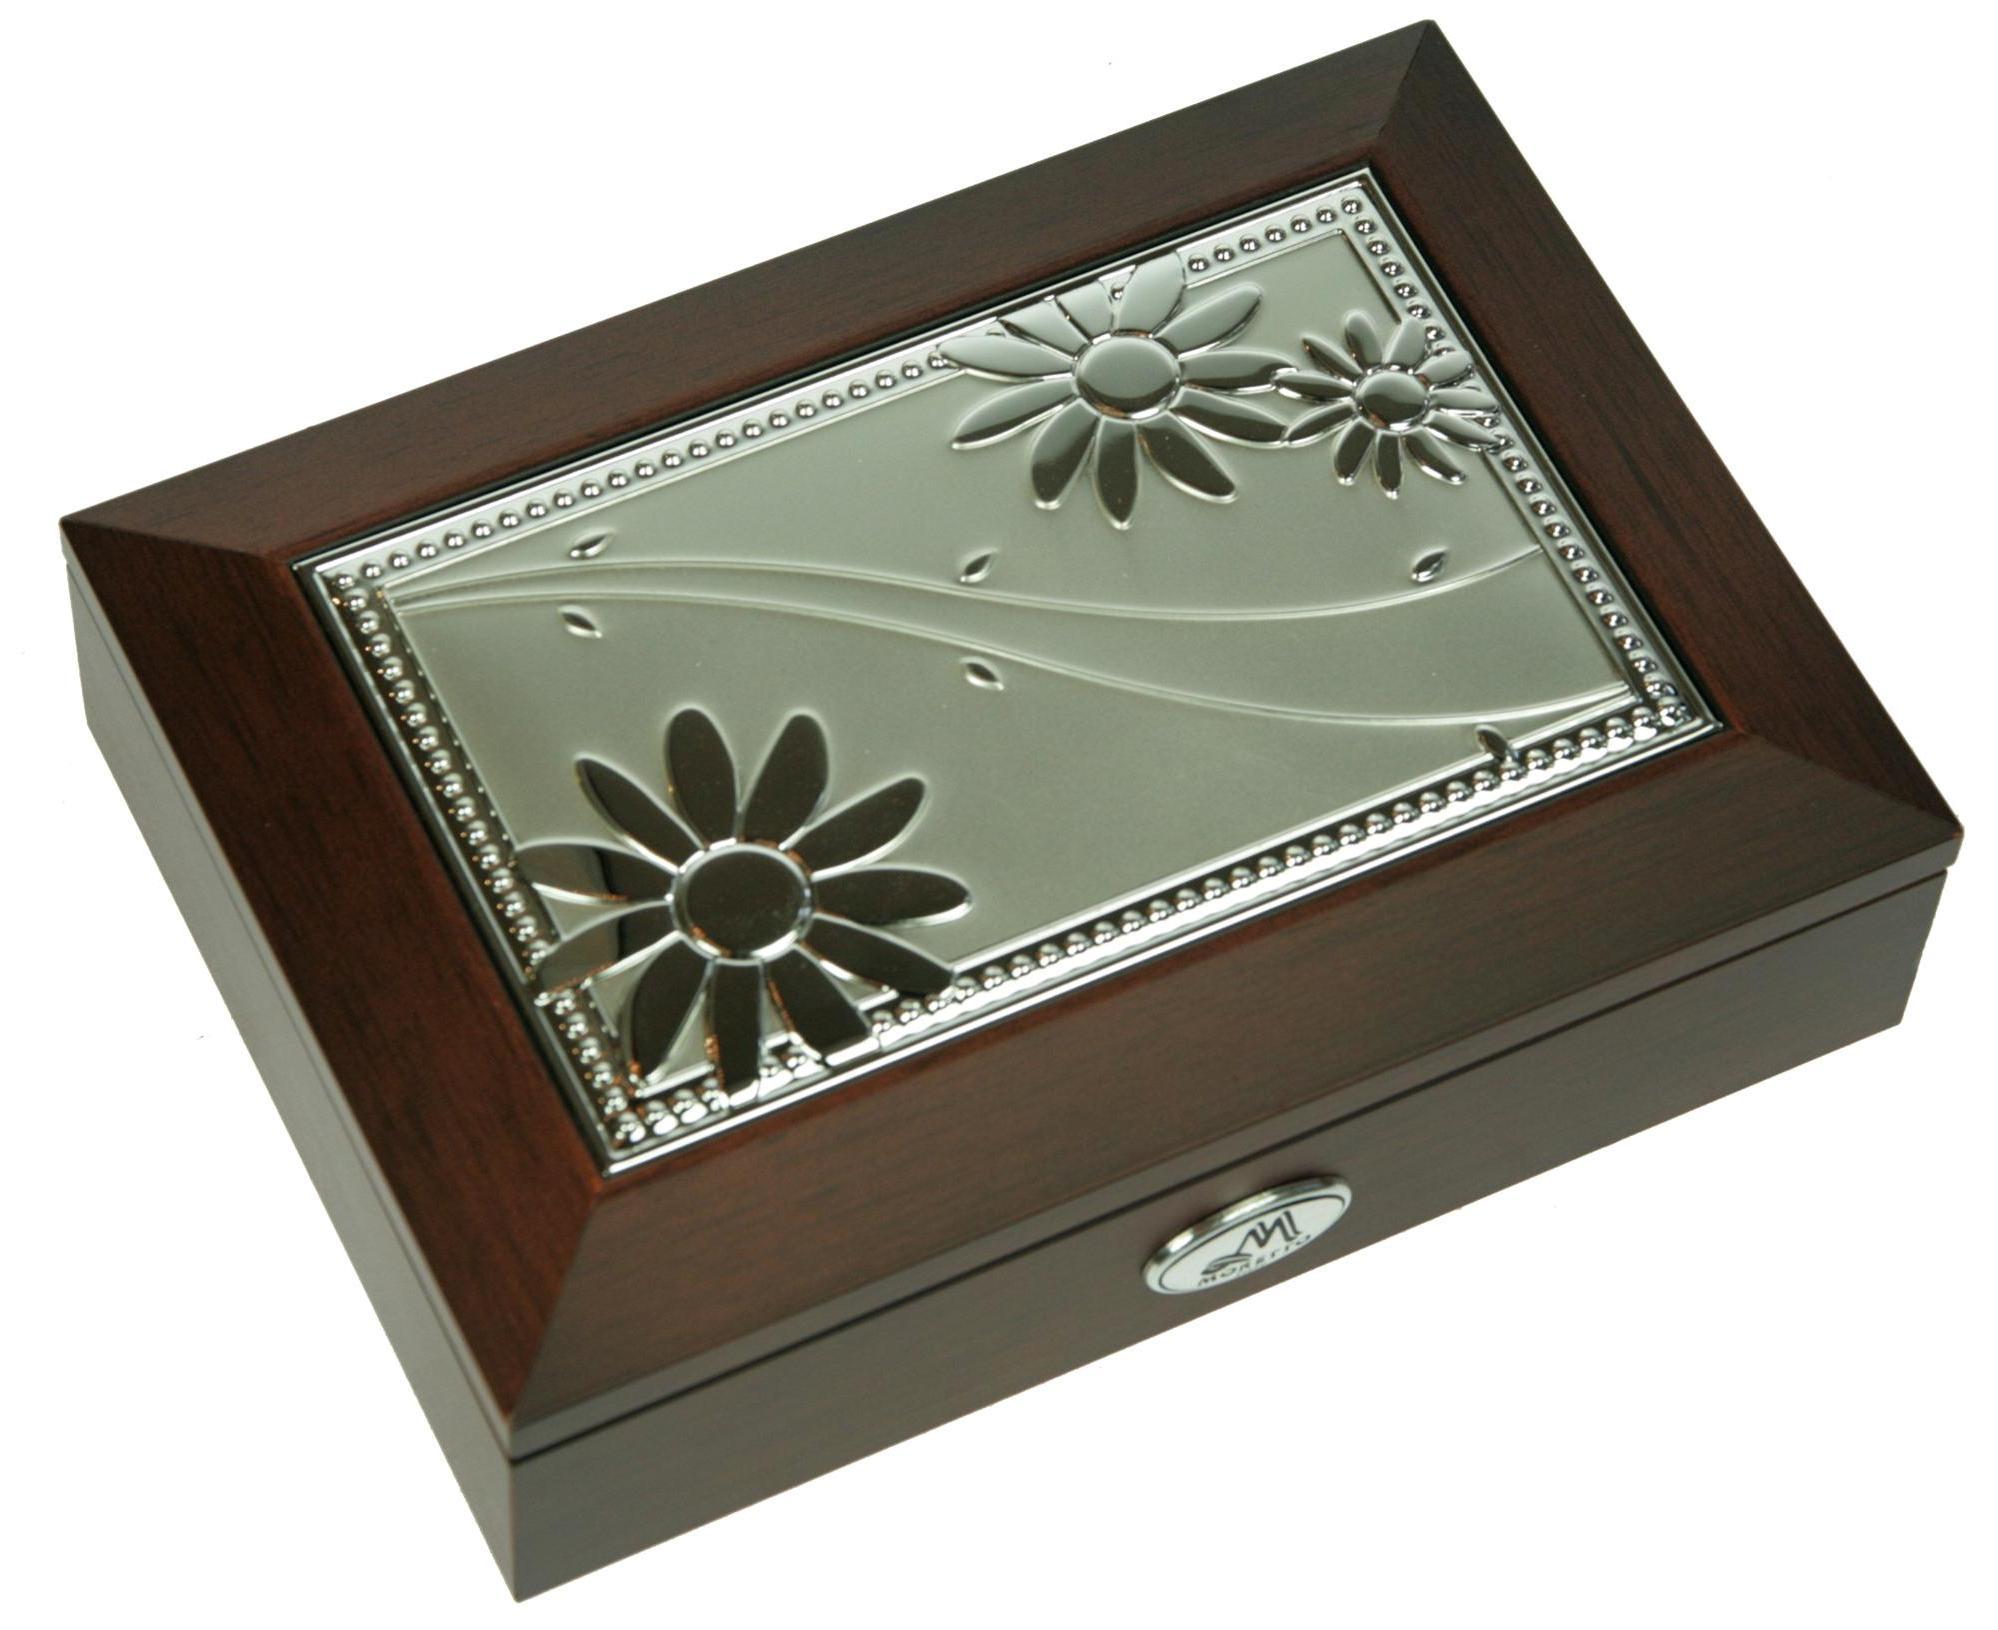 Шкатулка для ювелирных украшений Moretto, 18 х 13 х 5 см. 39849 шкатулка для ювелирных украшений moretto 18 х 13 х 5 см 39849